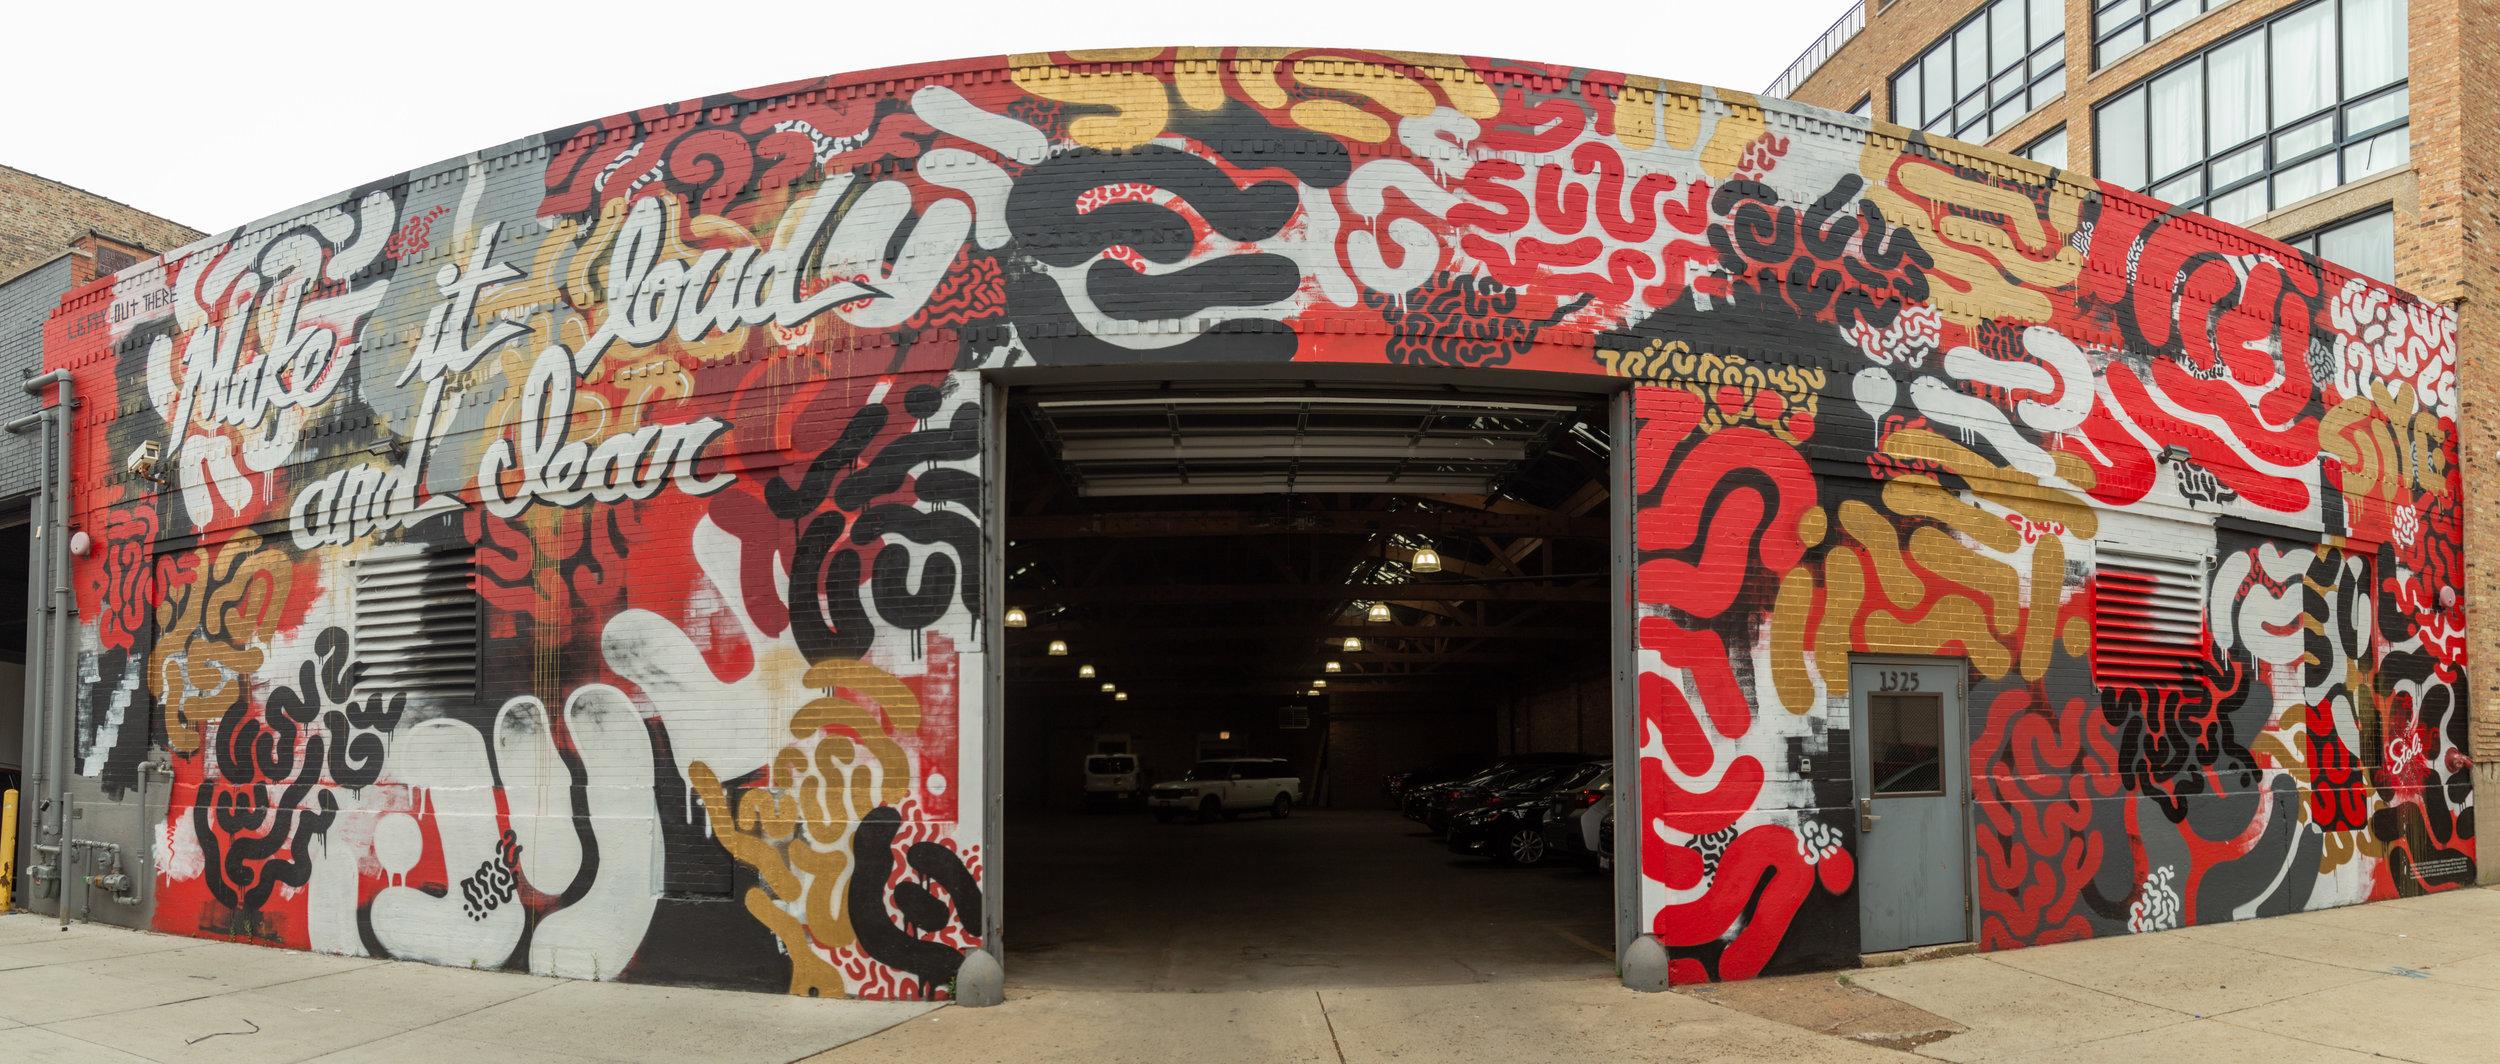 Lefty Stoli Wall.jpg